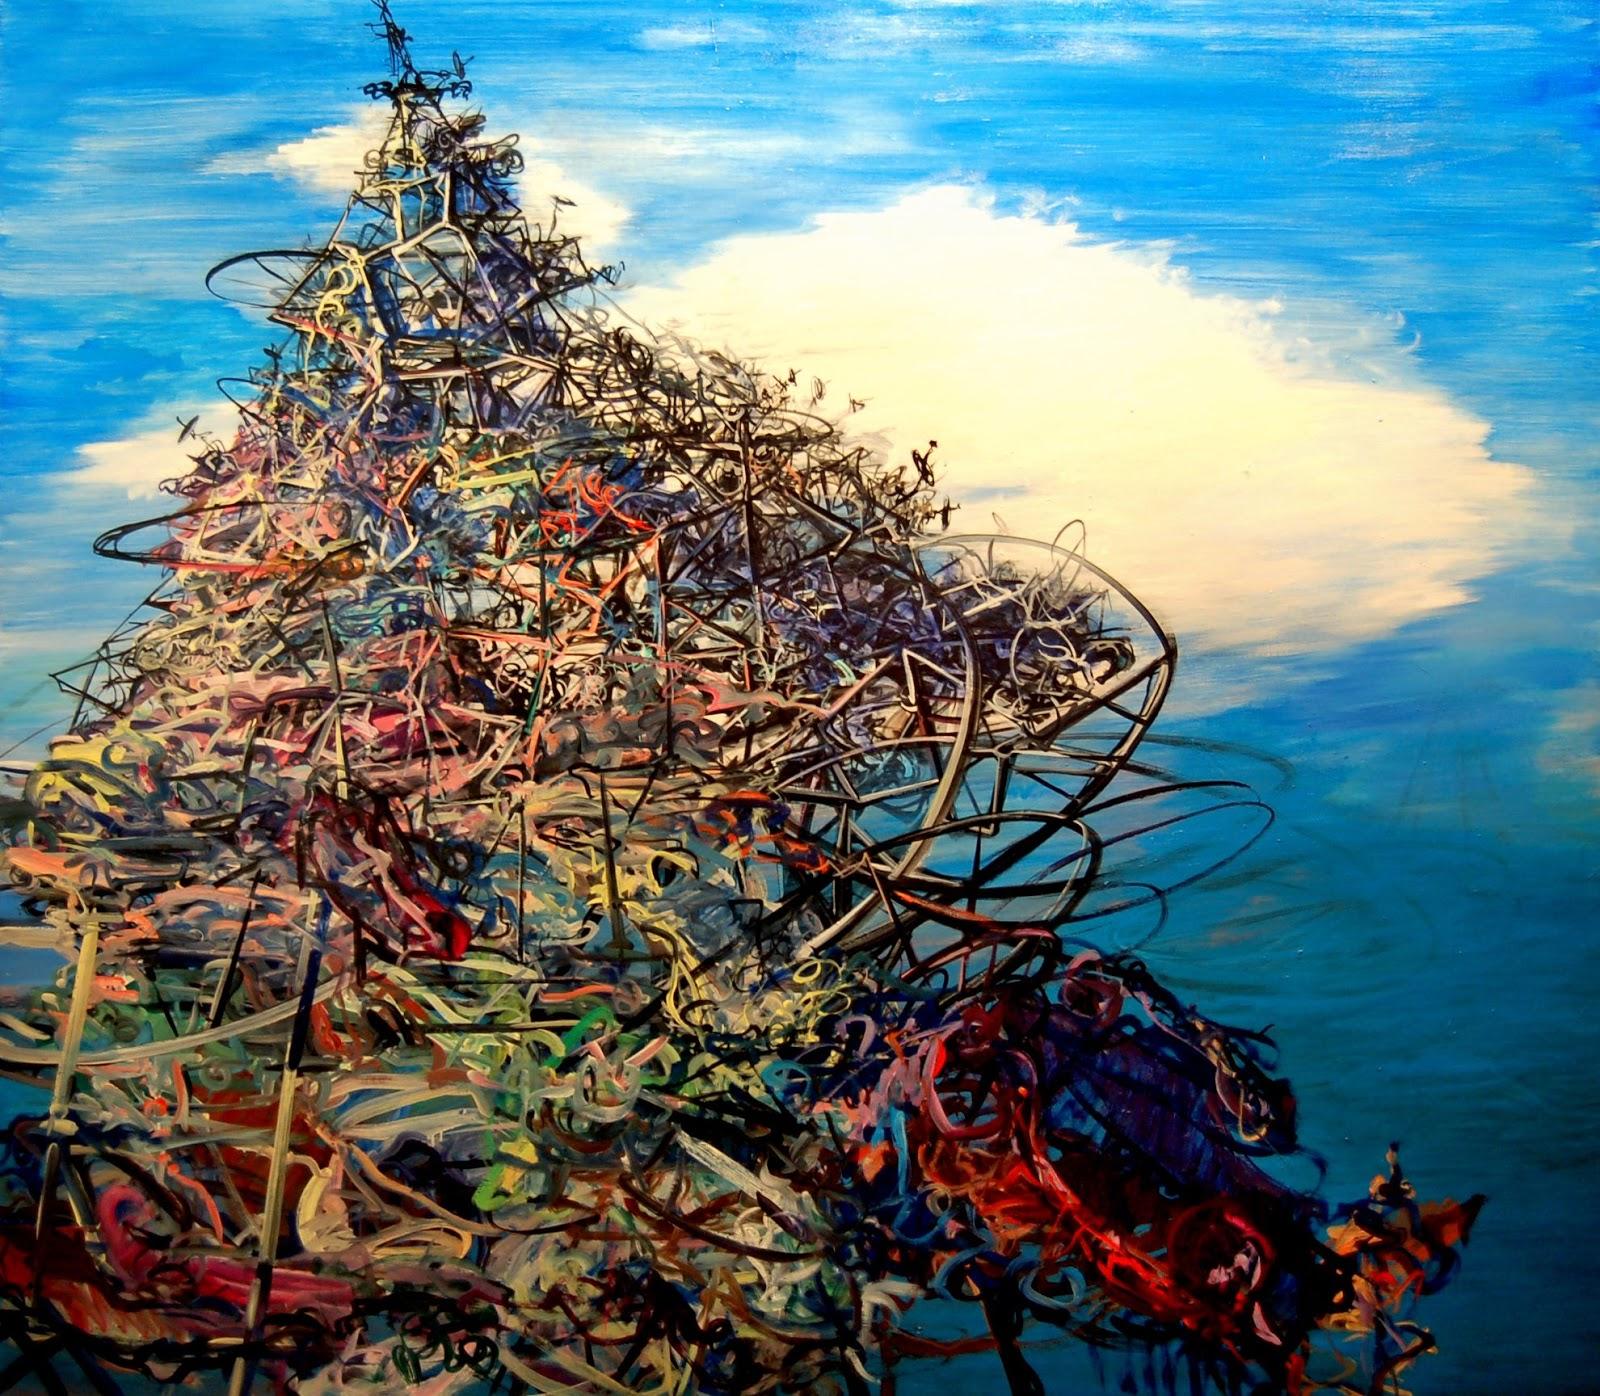 Deborah Brown, Slag, 2013, oil on canvas, 70 x 80 inches (courtesy of the artist